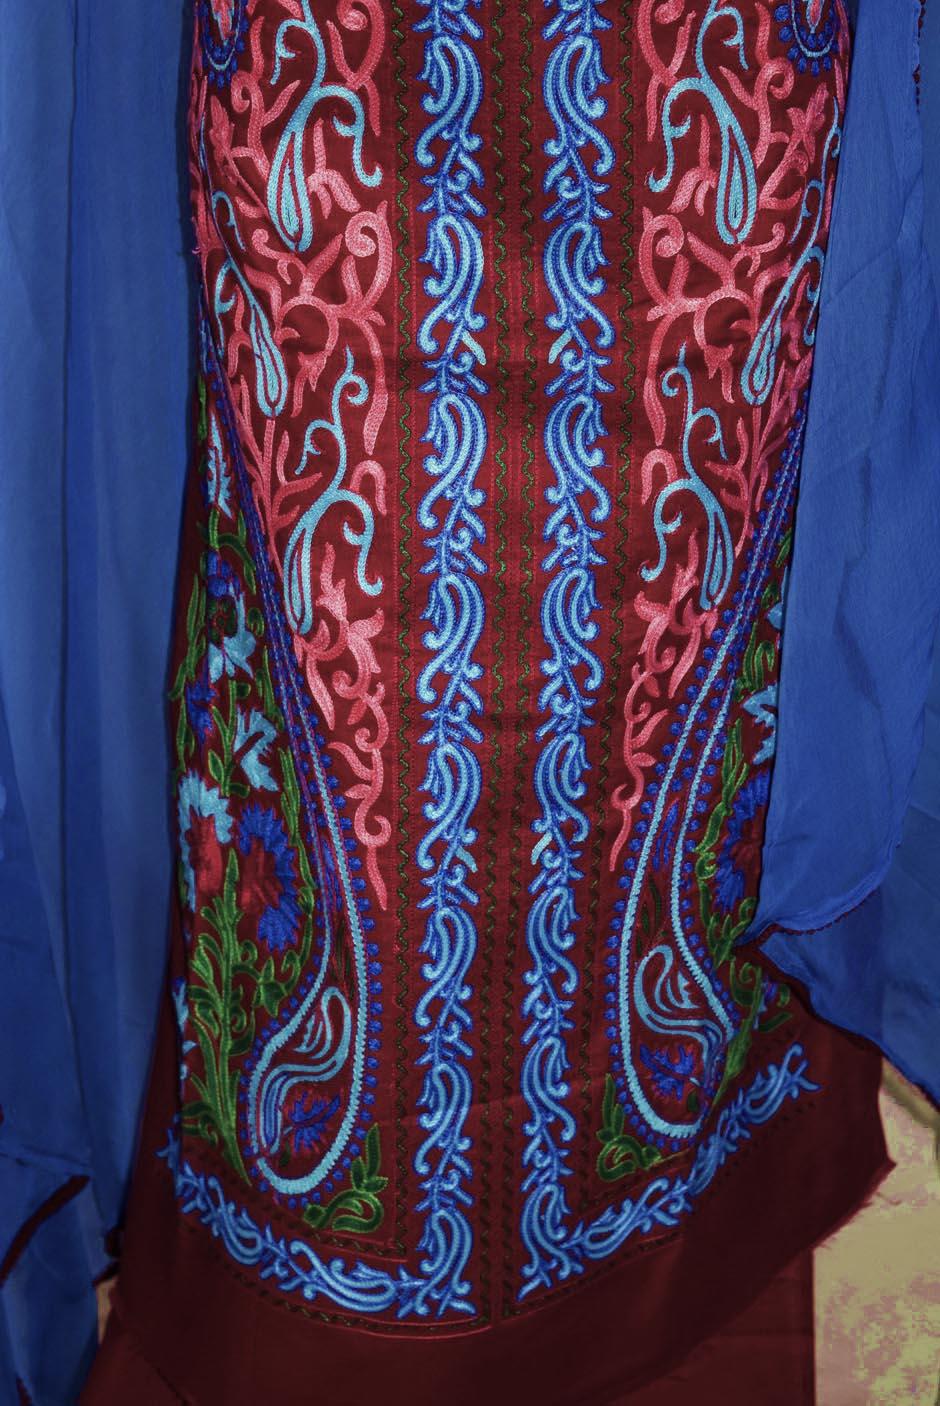 Kashmiri Embroidery Cotton Salwar Suit Fabric with matching chiffon dupatta C0640 3